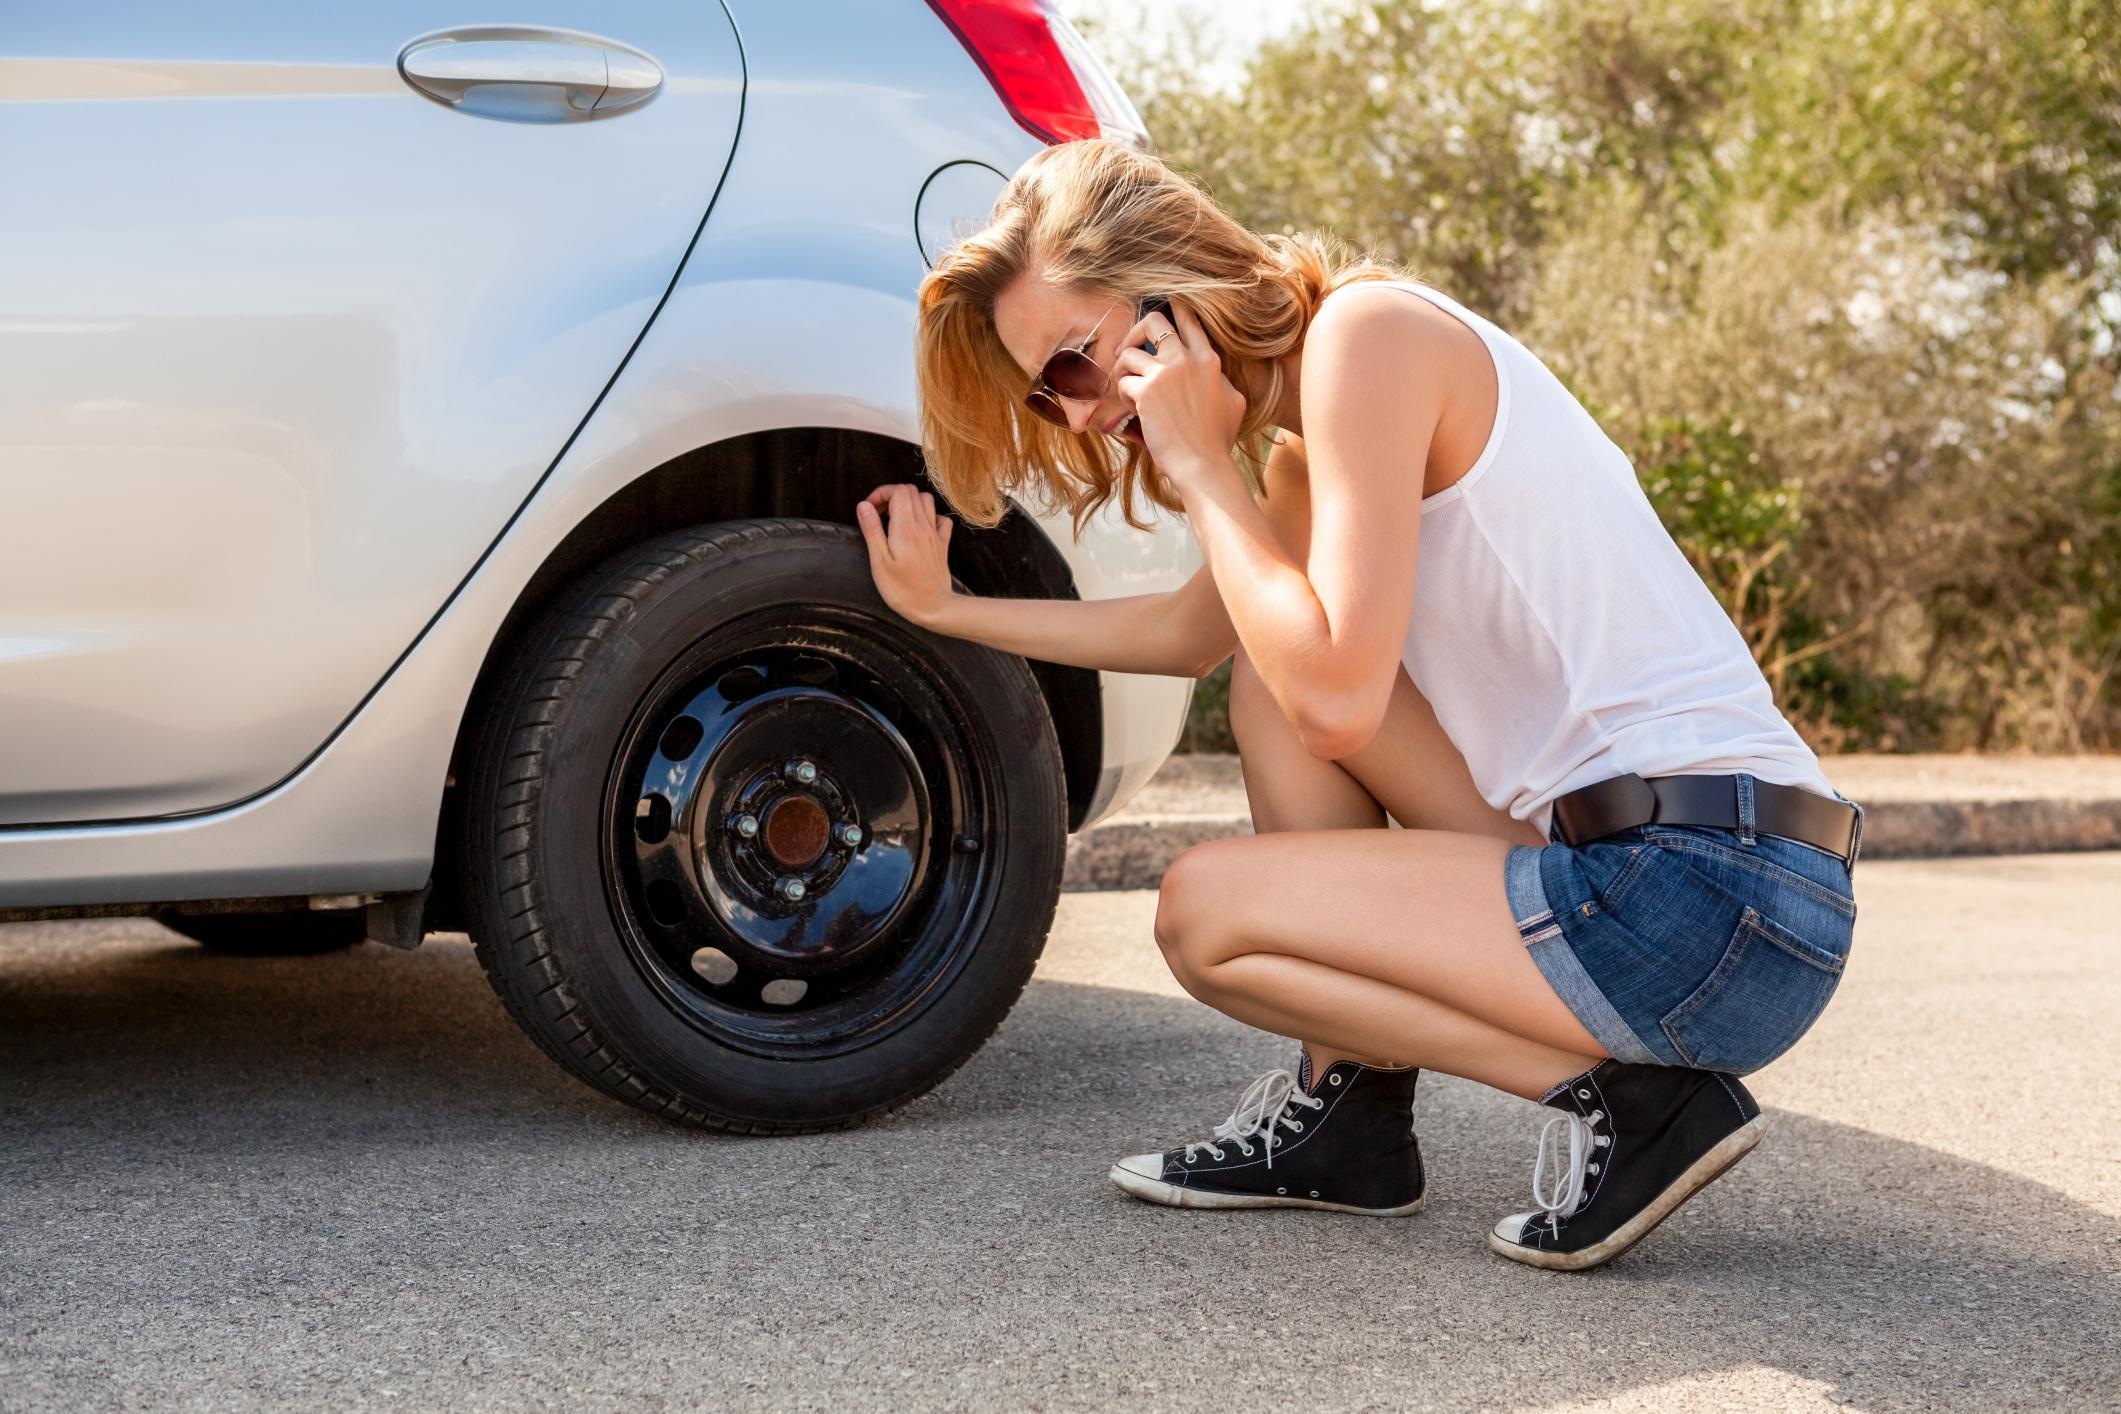 roadside service toronto mississauga flat tire